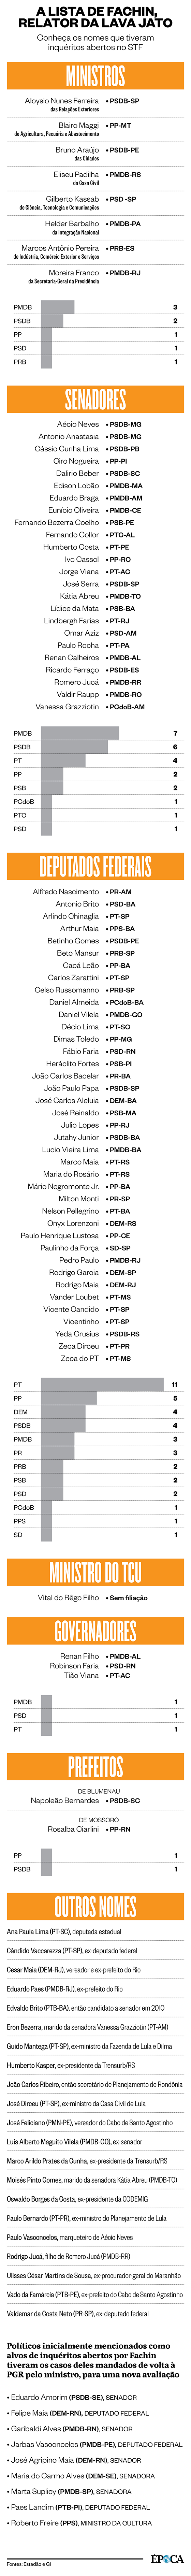 A lista de Fachin, relator da Lava Jato (Foto: ÉPOCA)